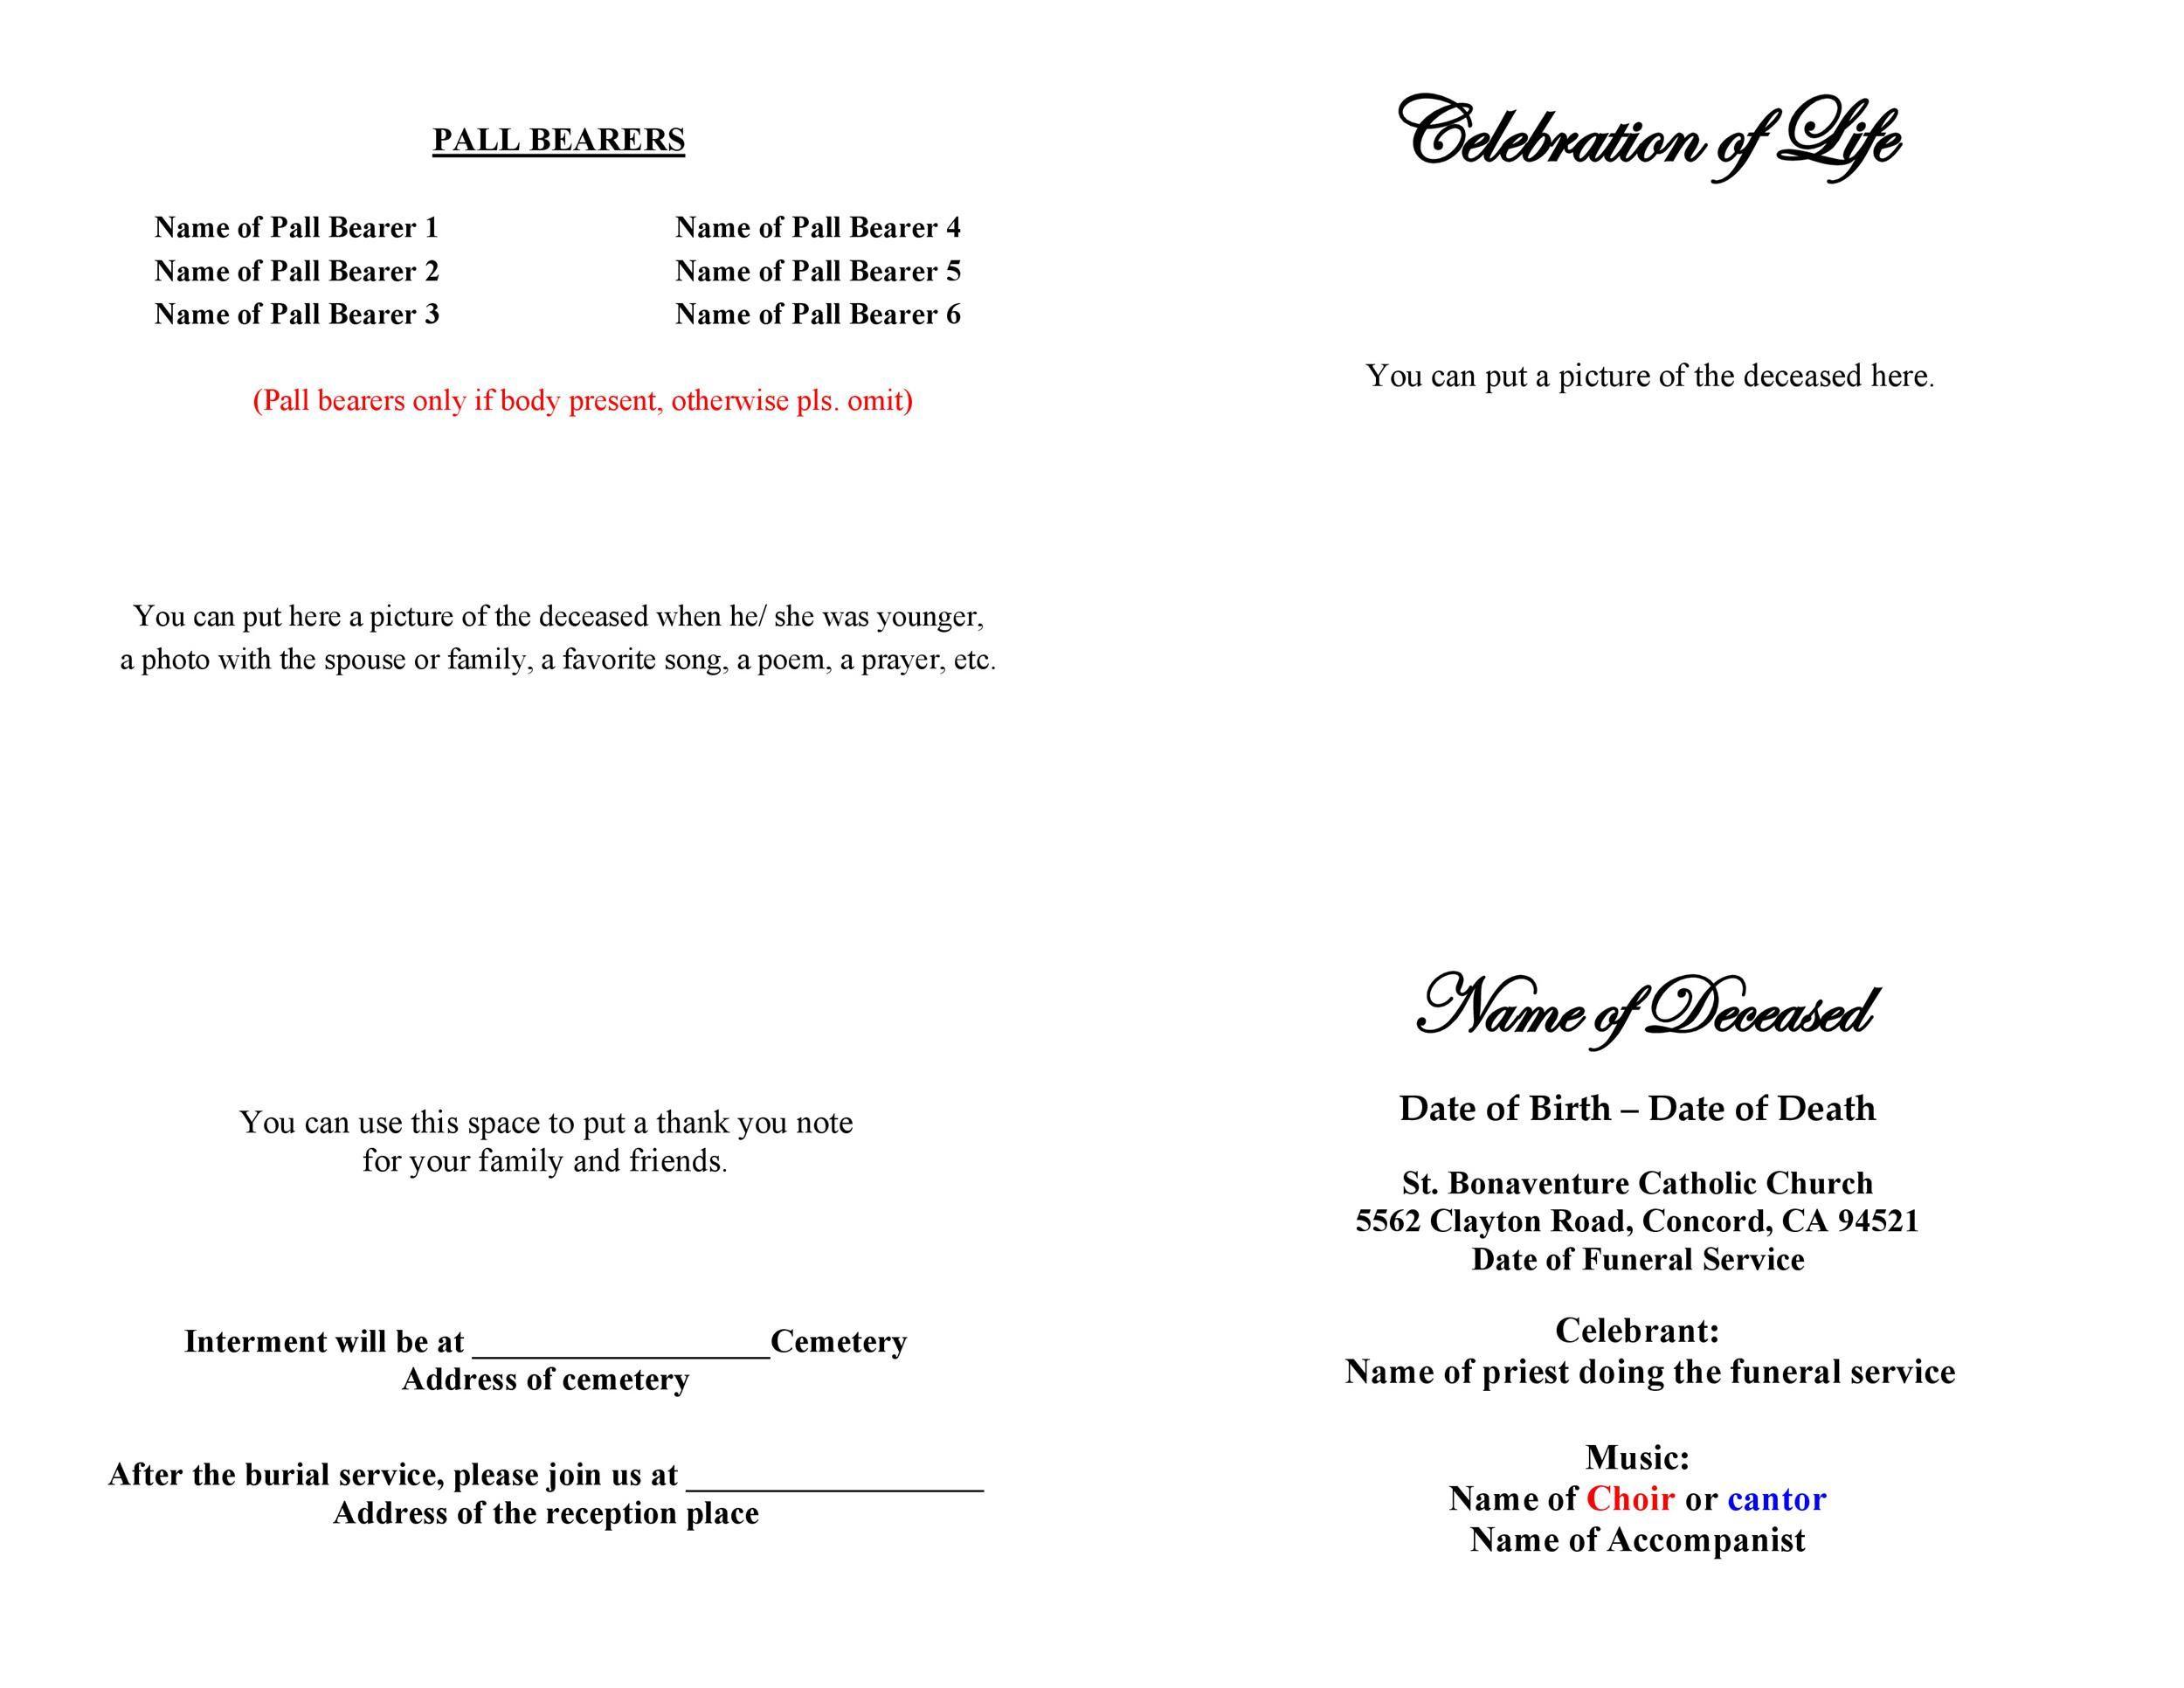 007 Rare Celebration Of Life Program Template Free Image  WordFull